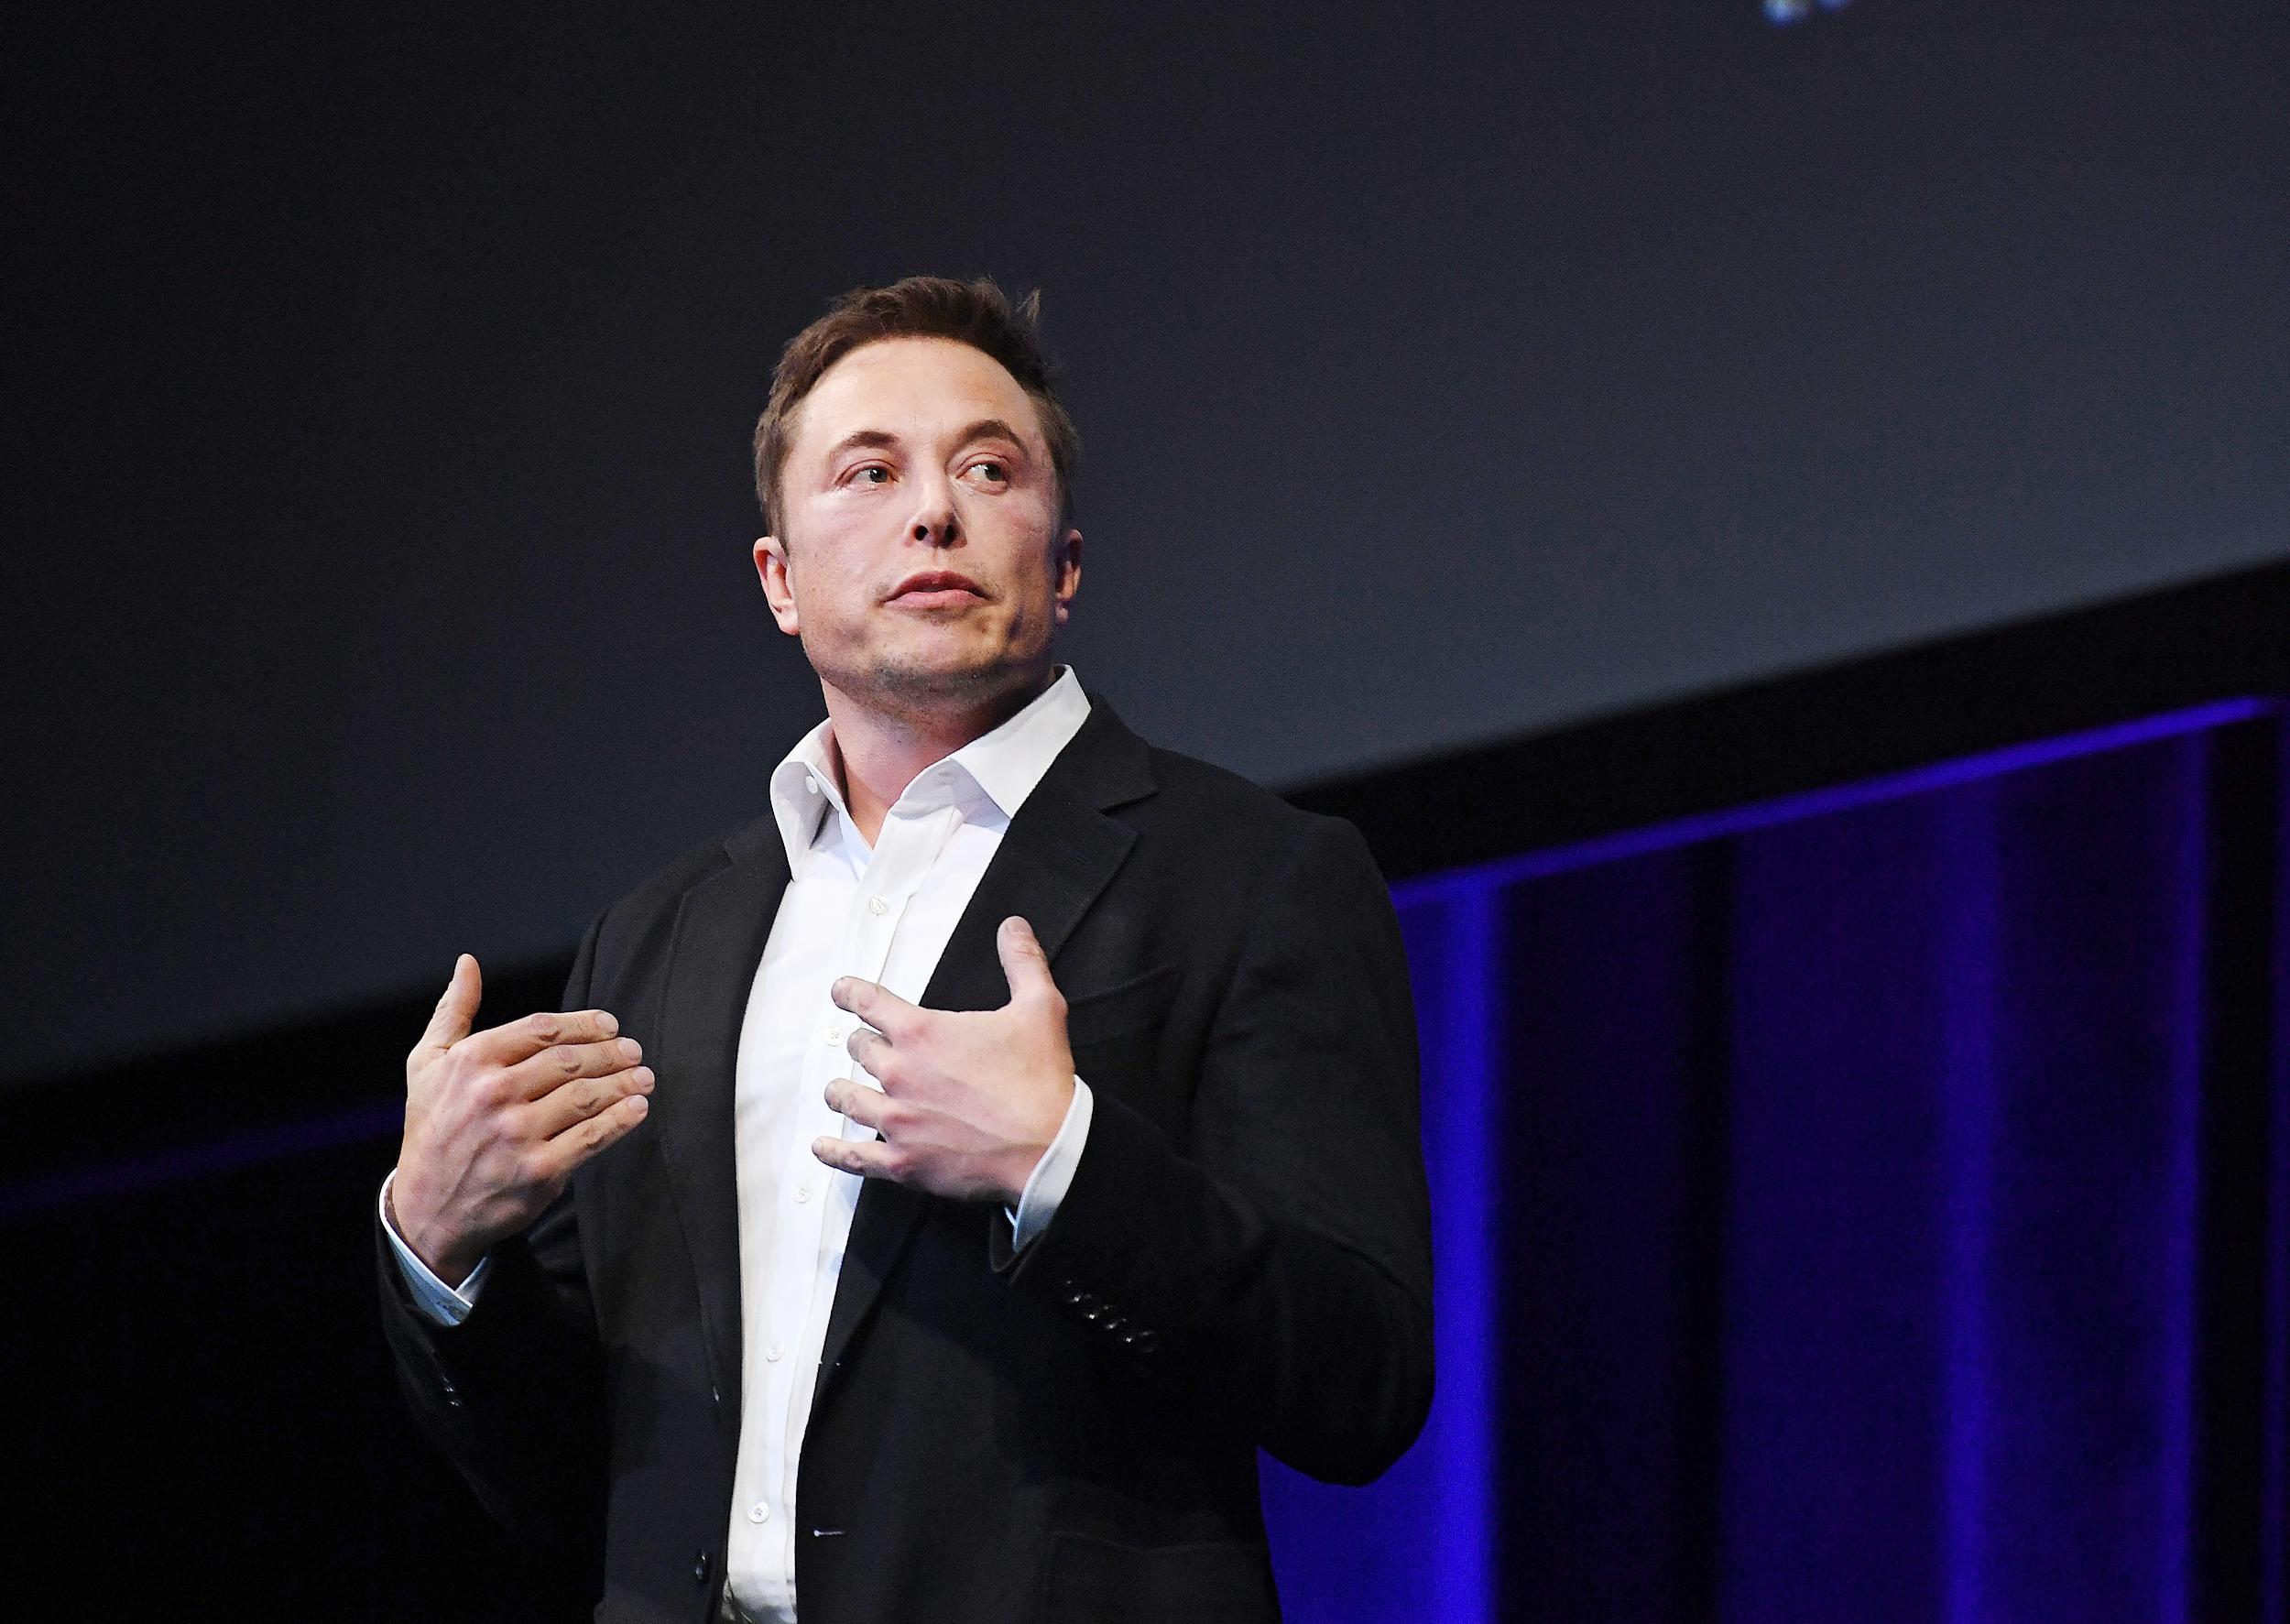 Elon-Musk-tweets-he's-'considering'-taking-Tesla-private